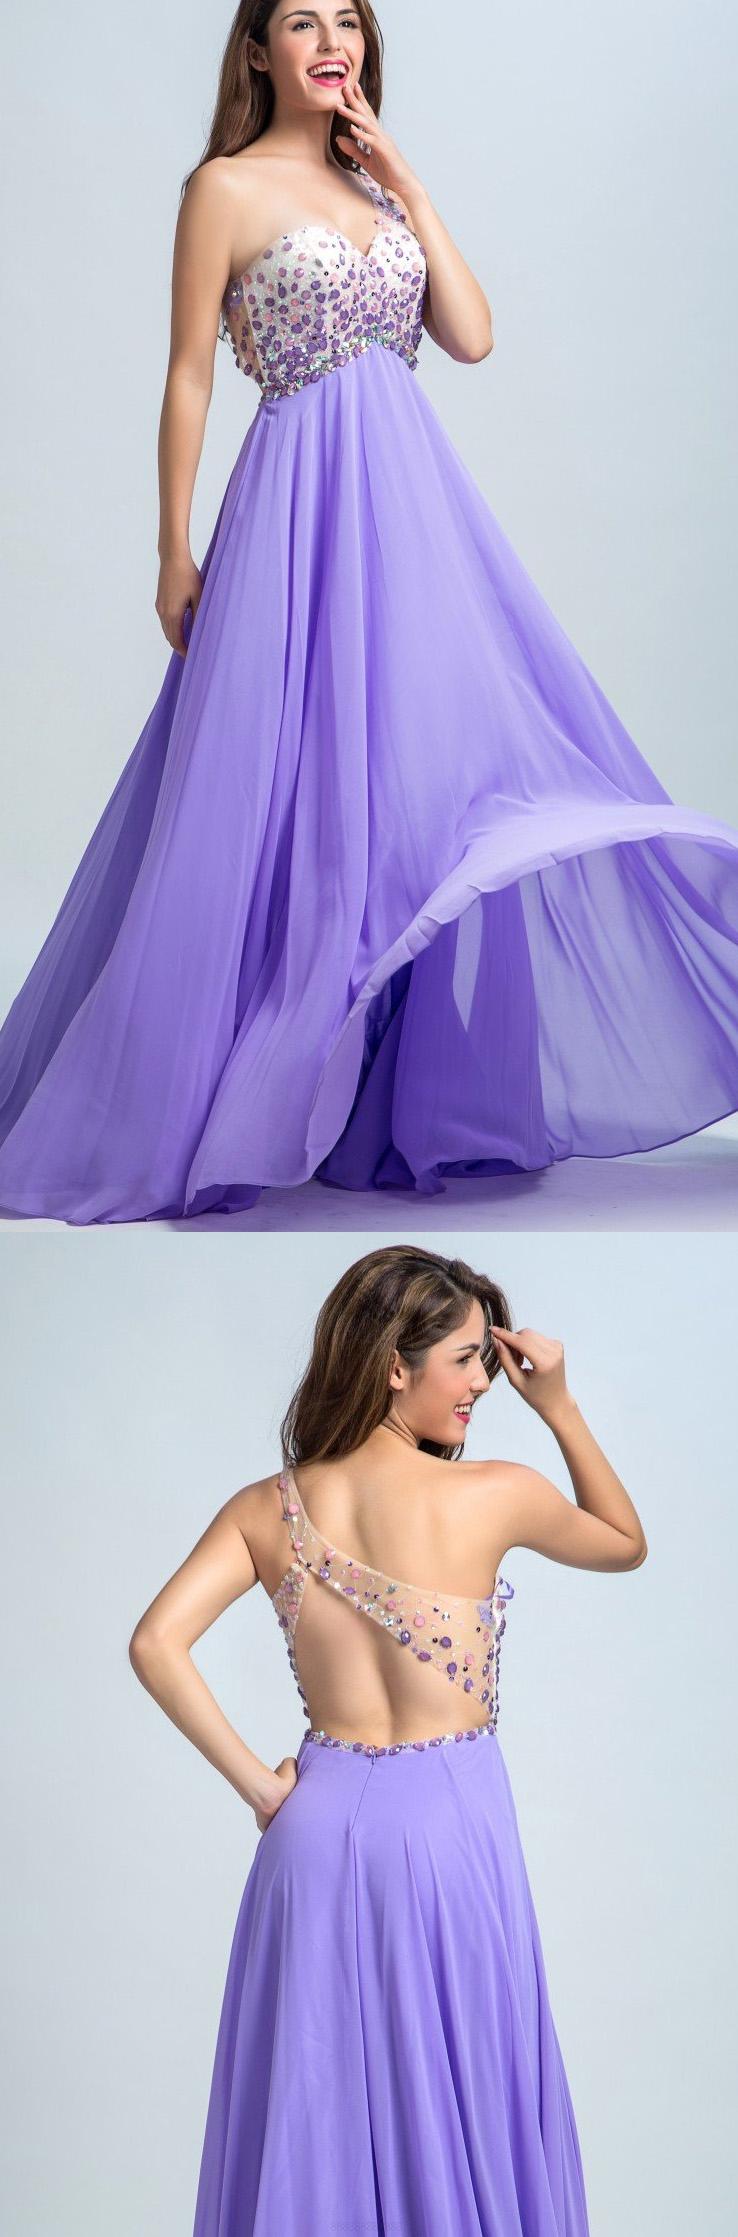 Lavender prom dresses long evening dresses sleeveless prom dresses